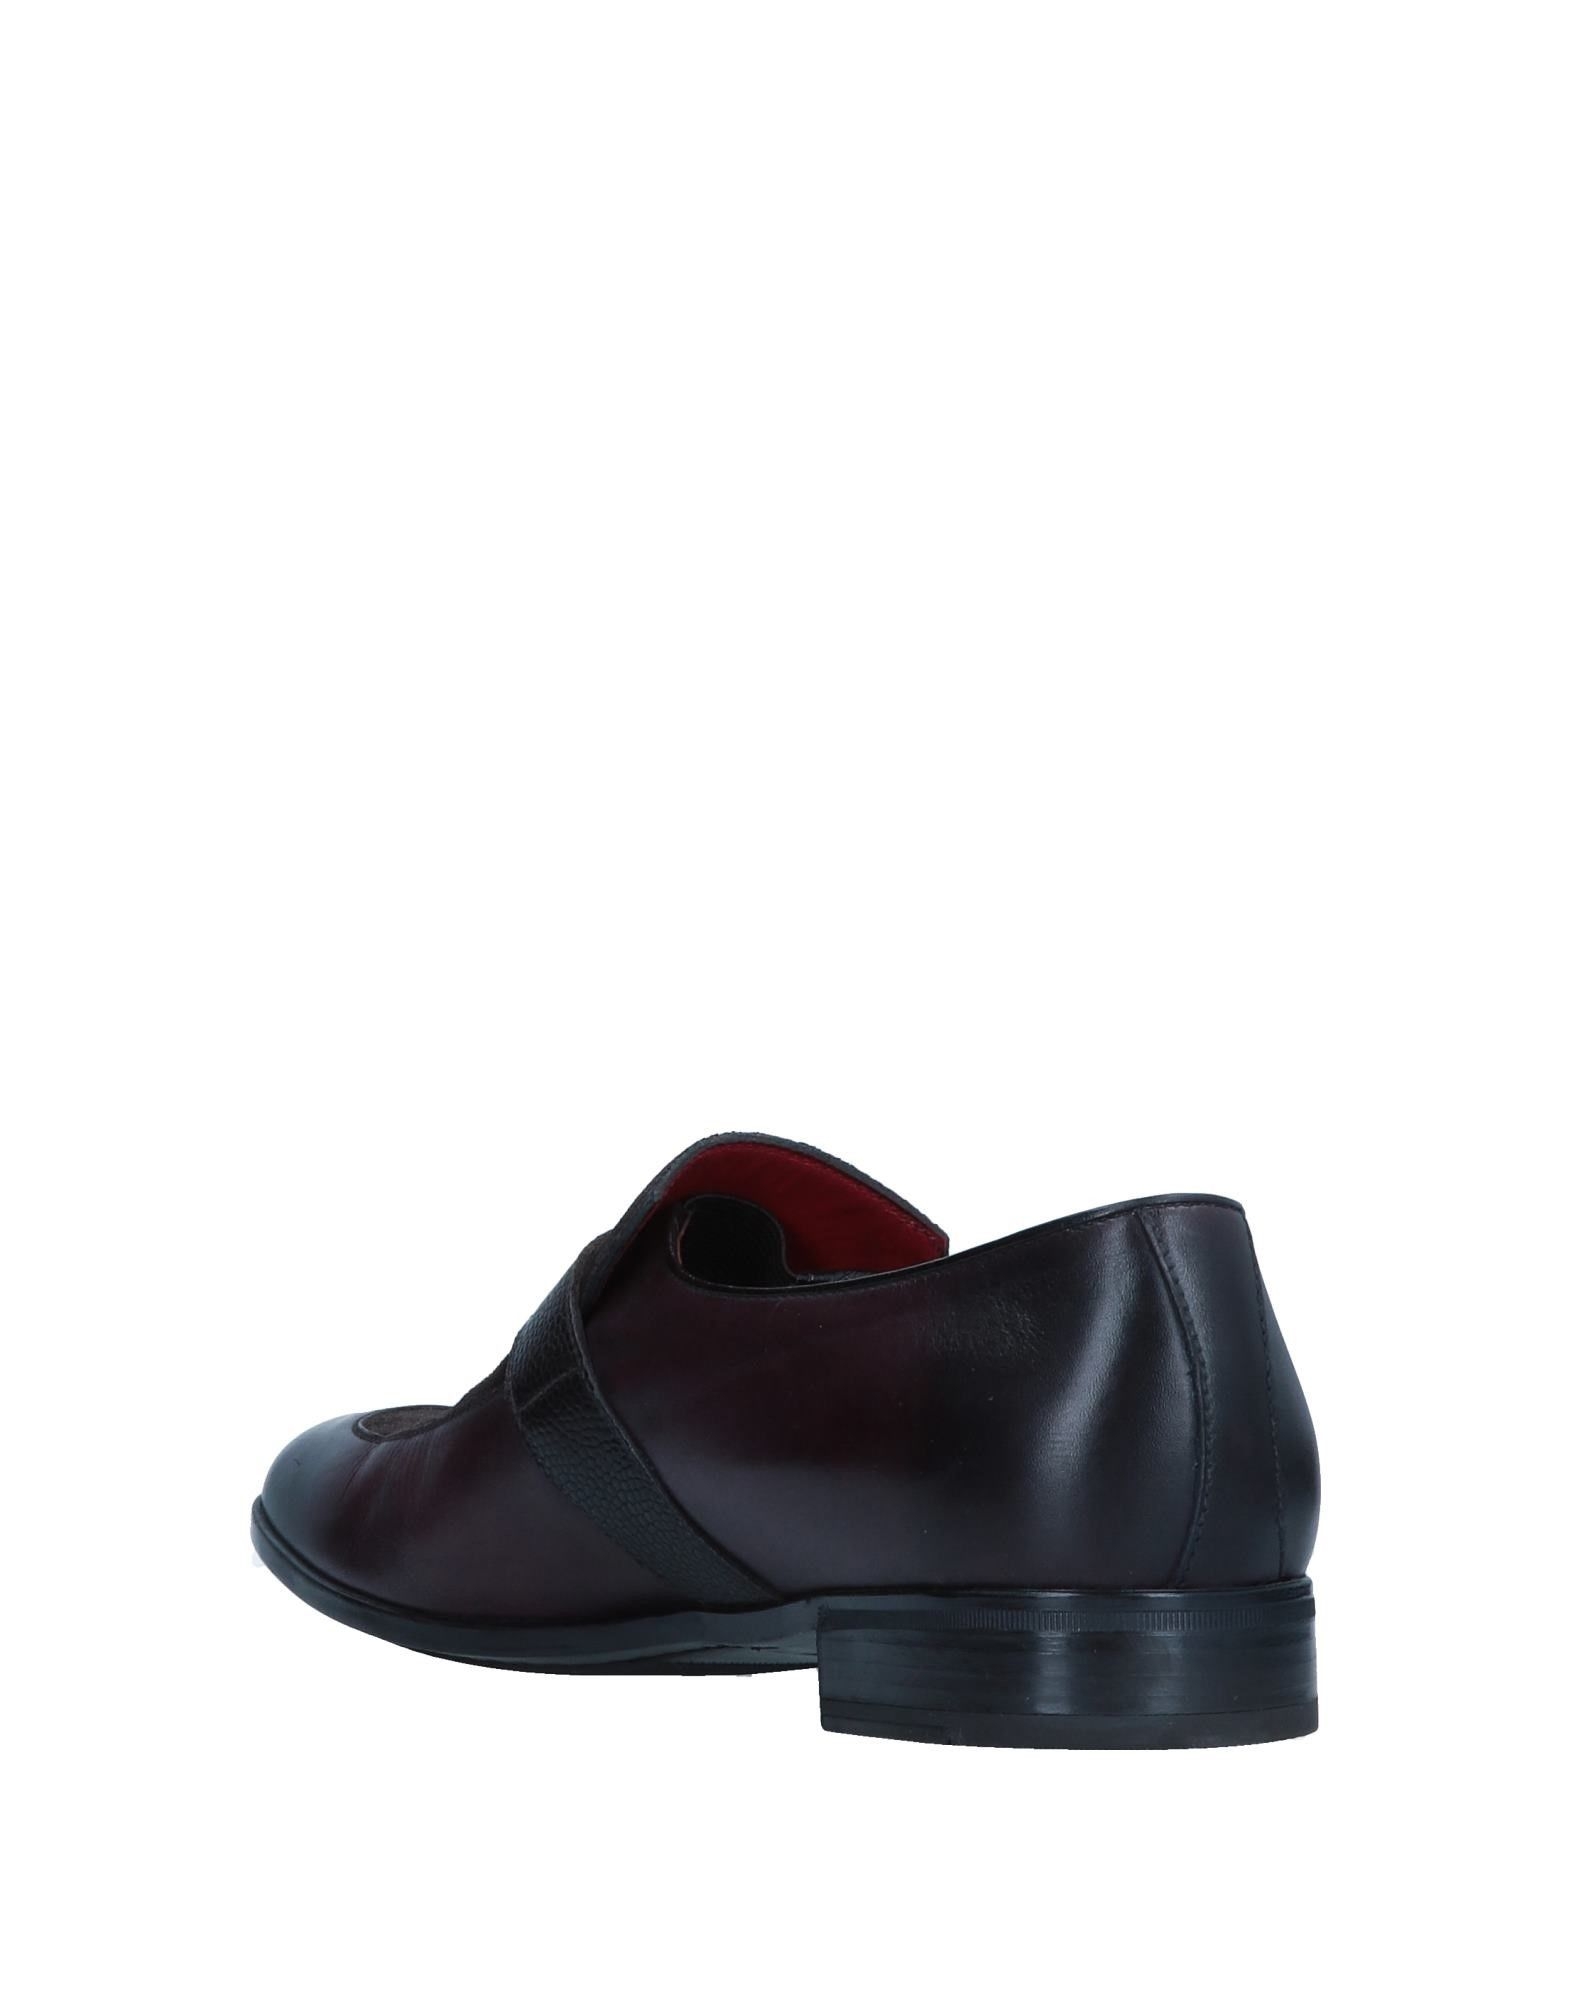 Barrett Mokassins Qualität Herren  11548306DQ Gute Qualität Mokassins beliebte Schuhe 8724c5